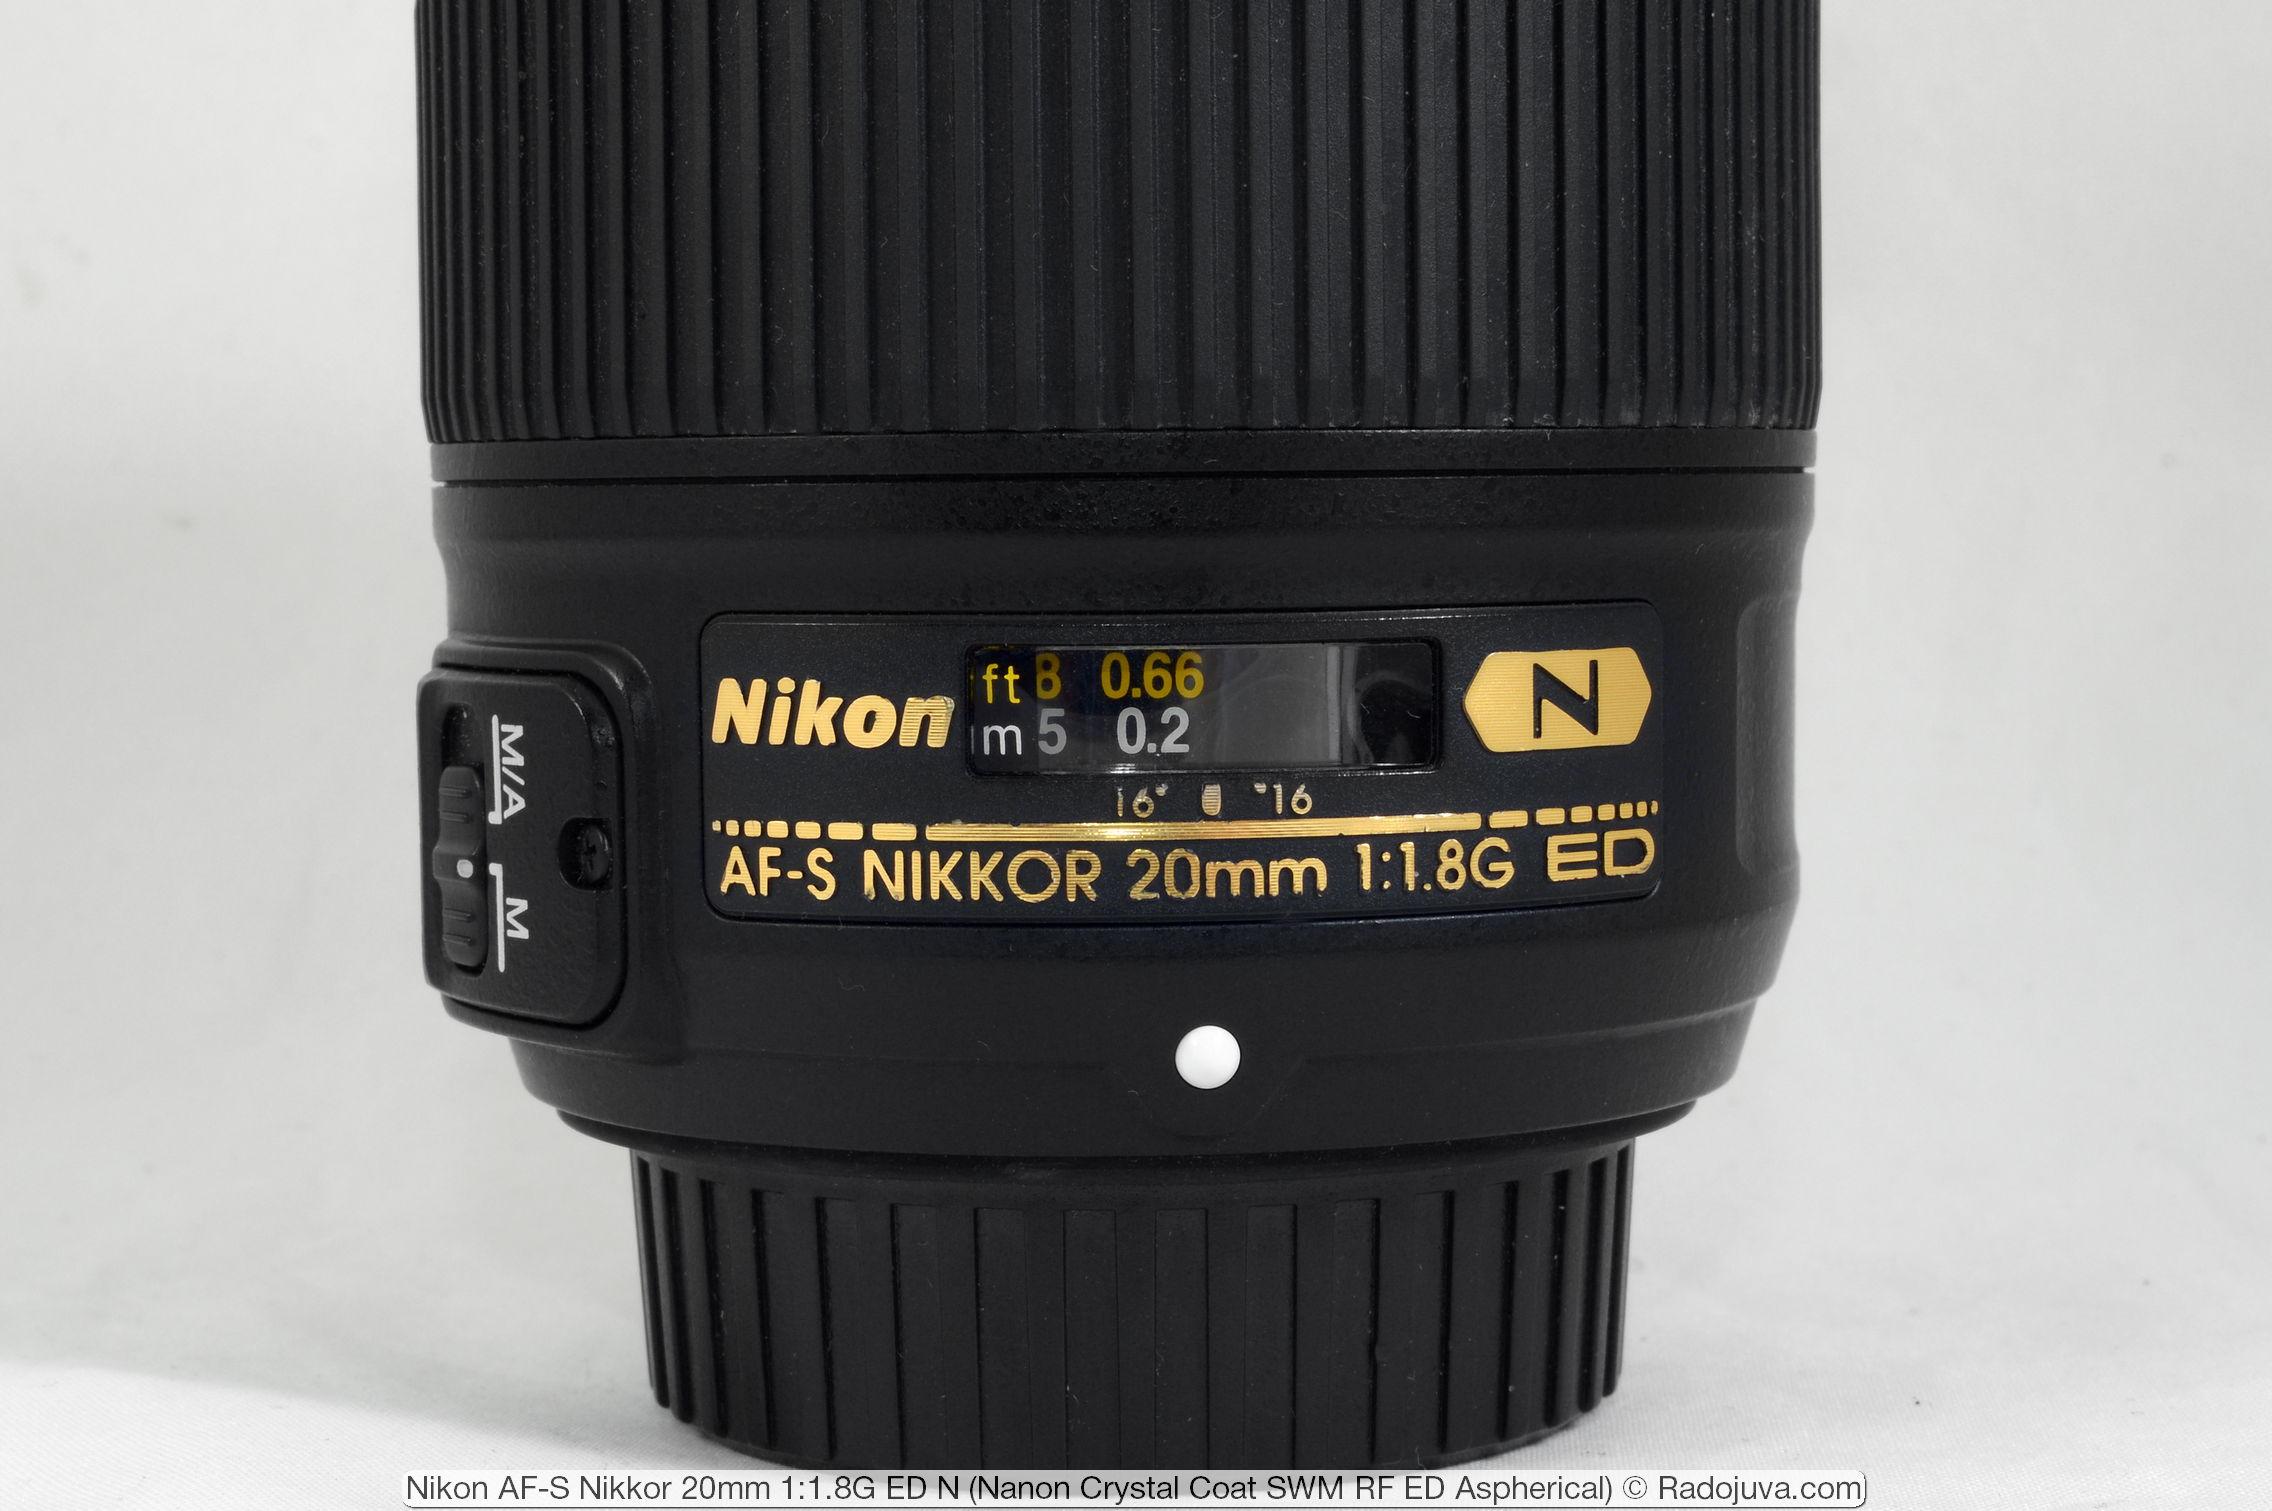 Nikon AF-S Nikkor 20mm 1:1.8G ED N (Nano Crystal Coat SWM RF ED Aspherical)